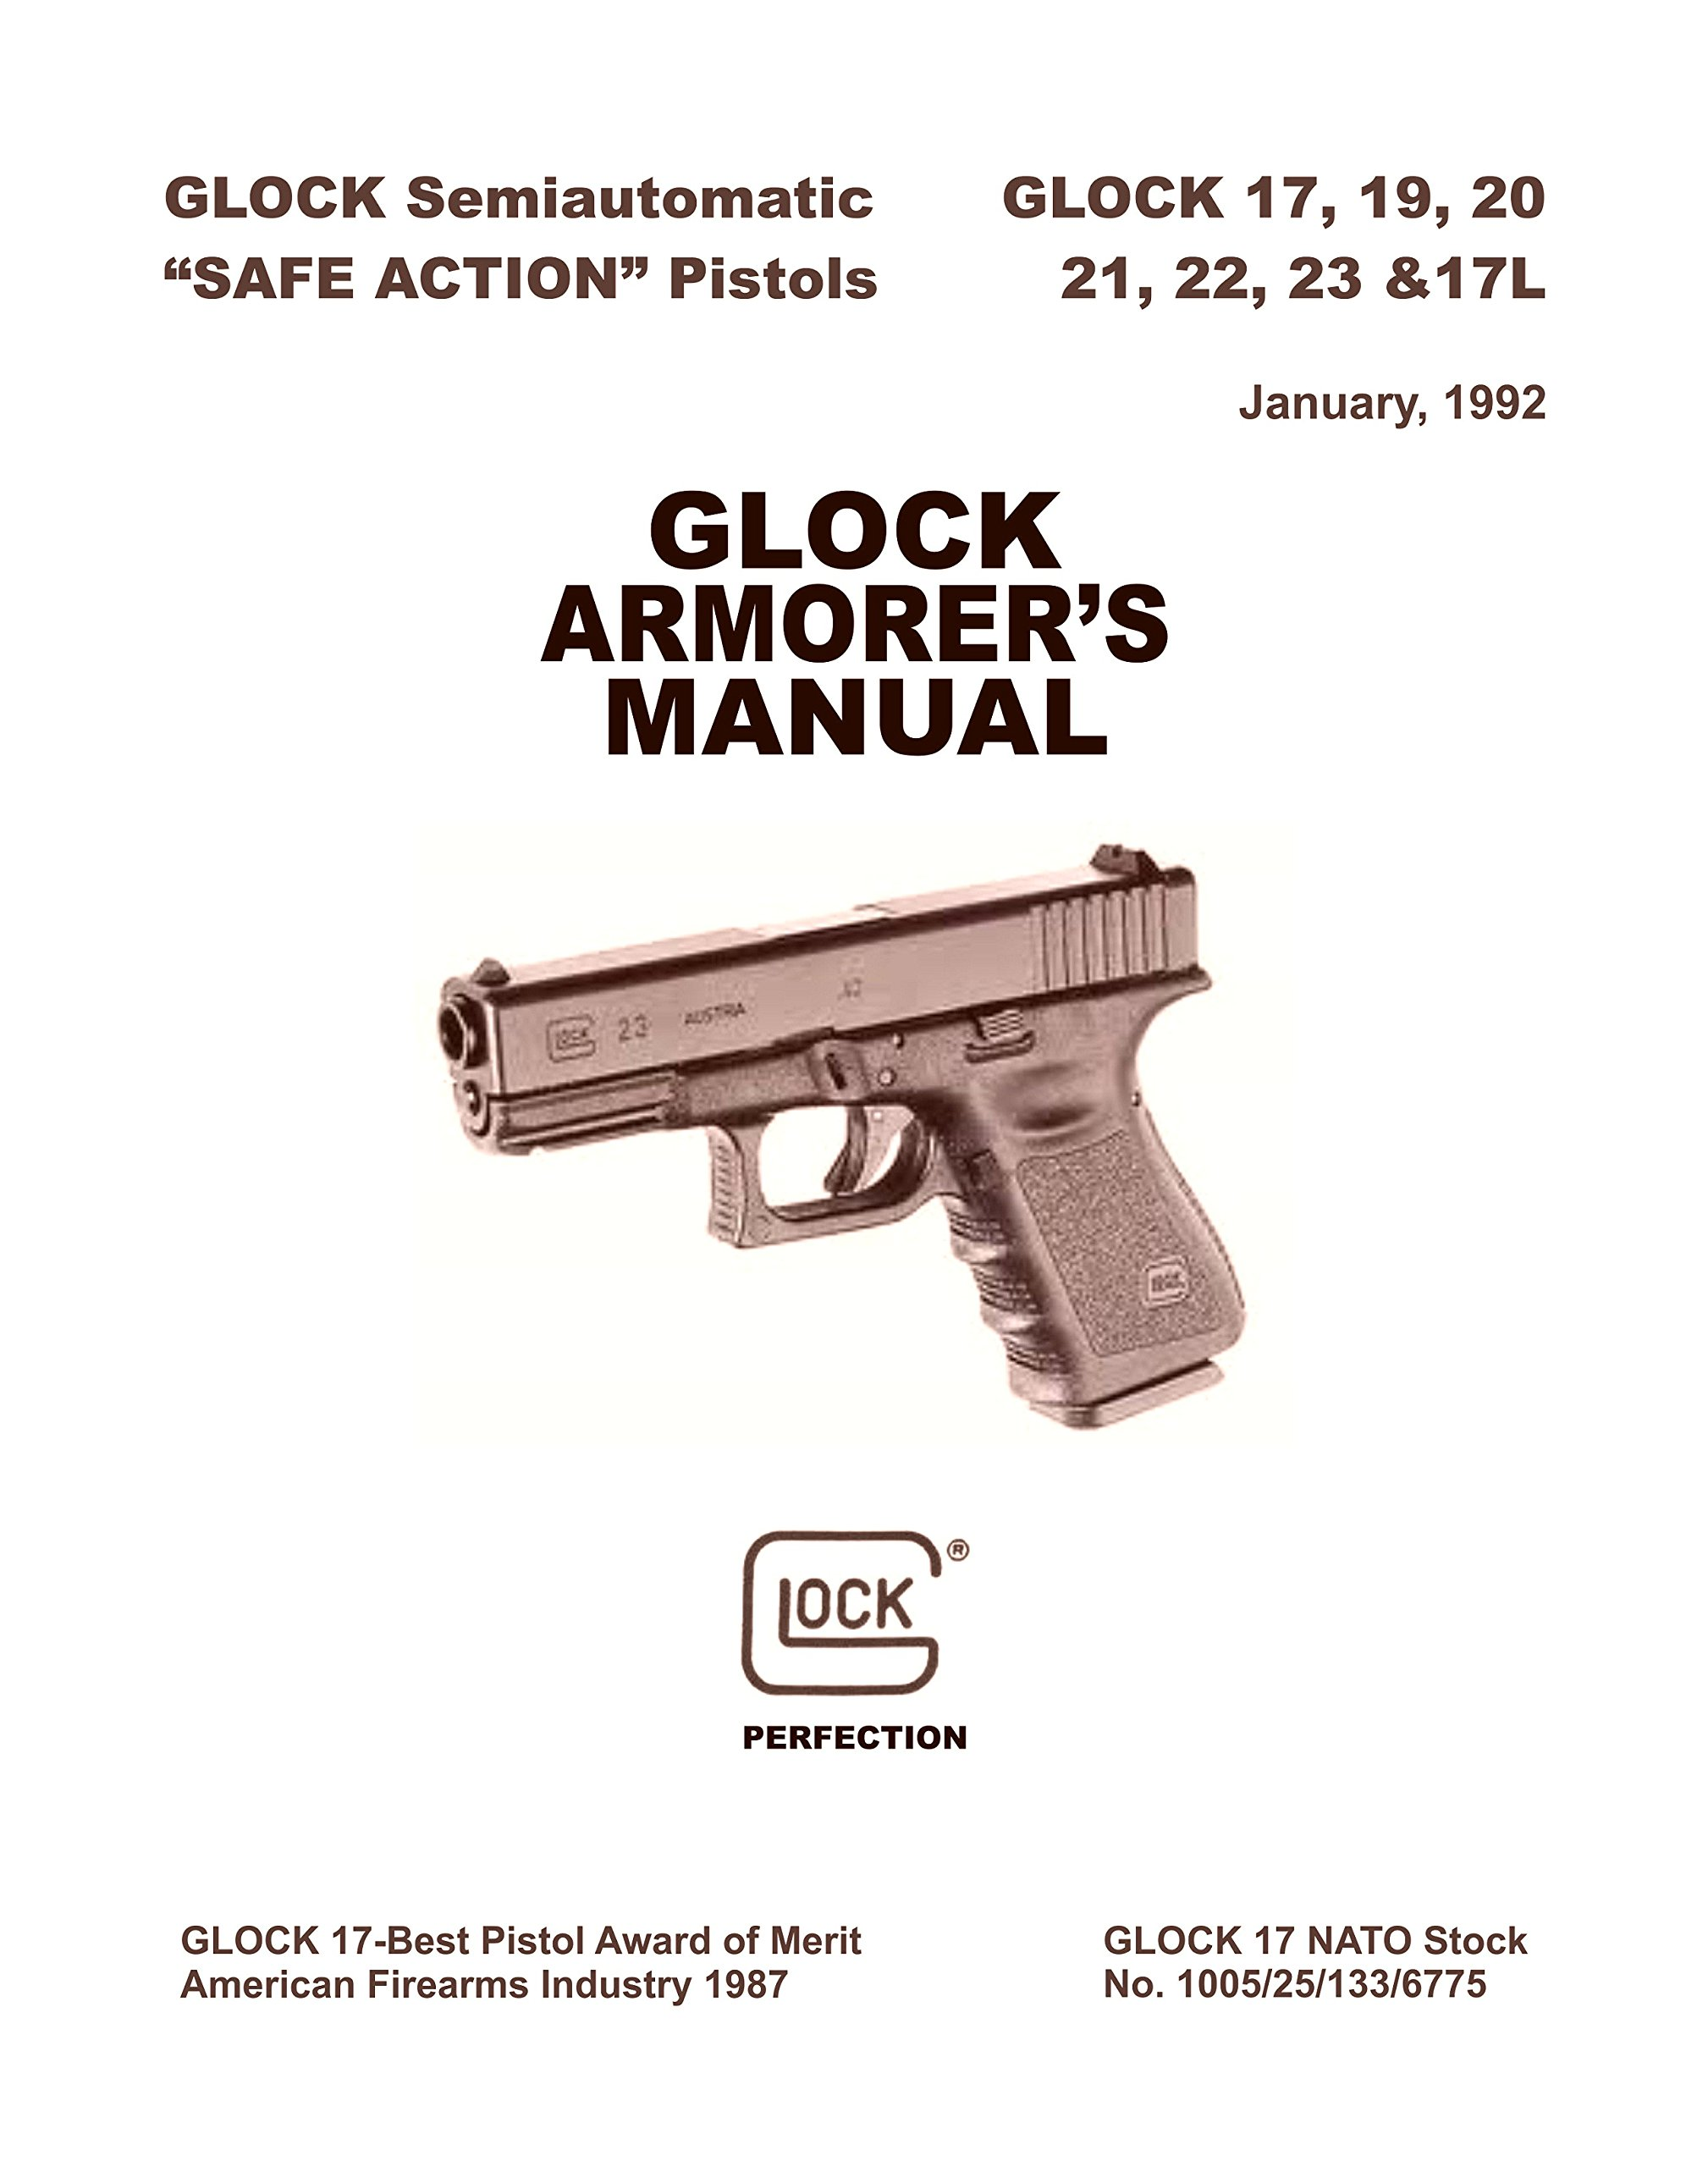 Glock 17 19 20 21 22 23 17L Pistol Armorer's Manual: GLOCK: Amazon.com:  Books